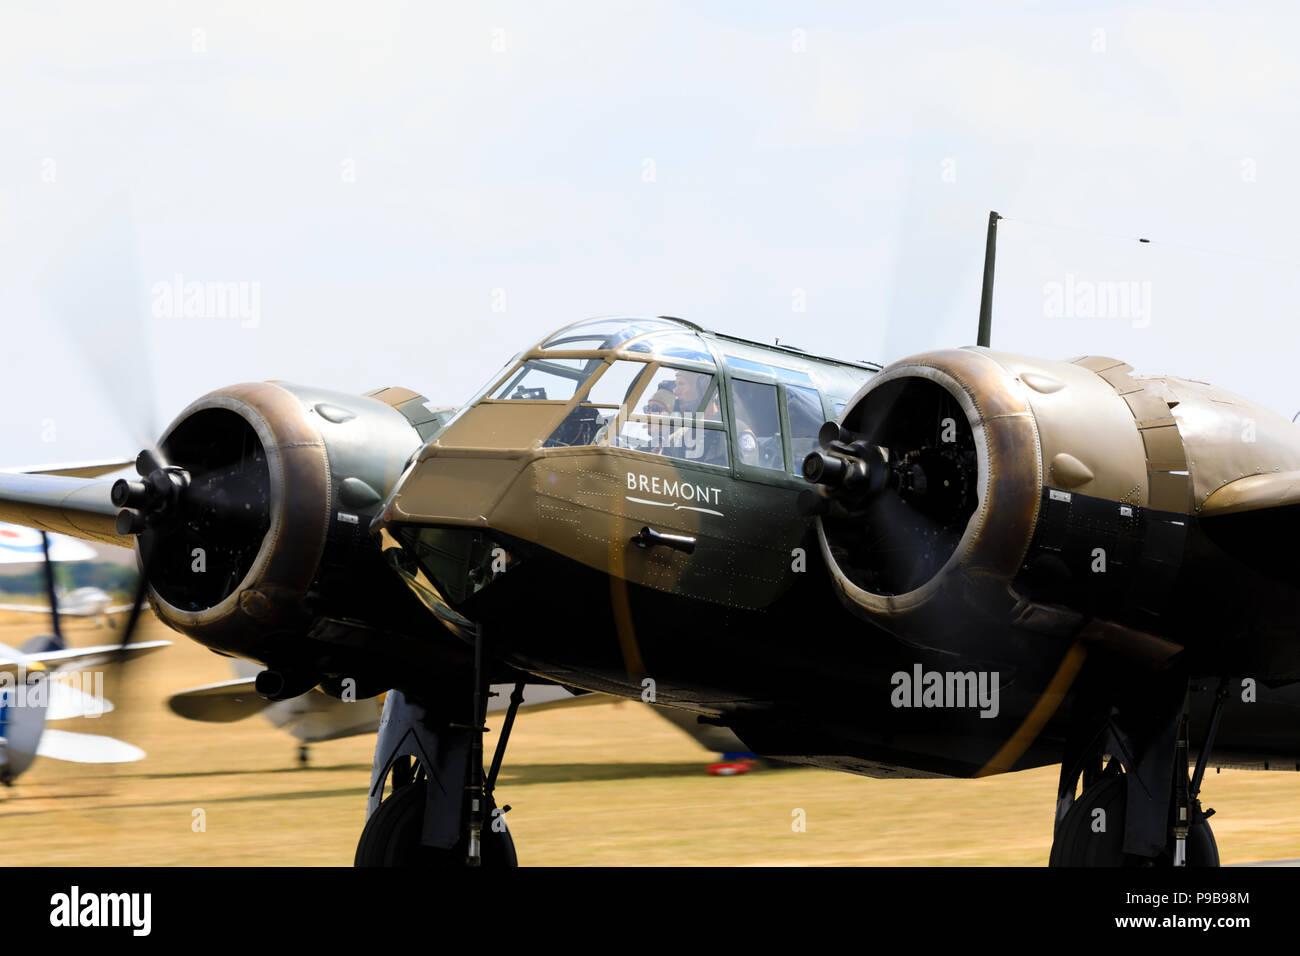 "Bristol Blenheim Mk1 ""Bremont"" with propellors turning. - Stock Image"